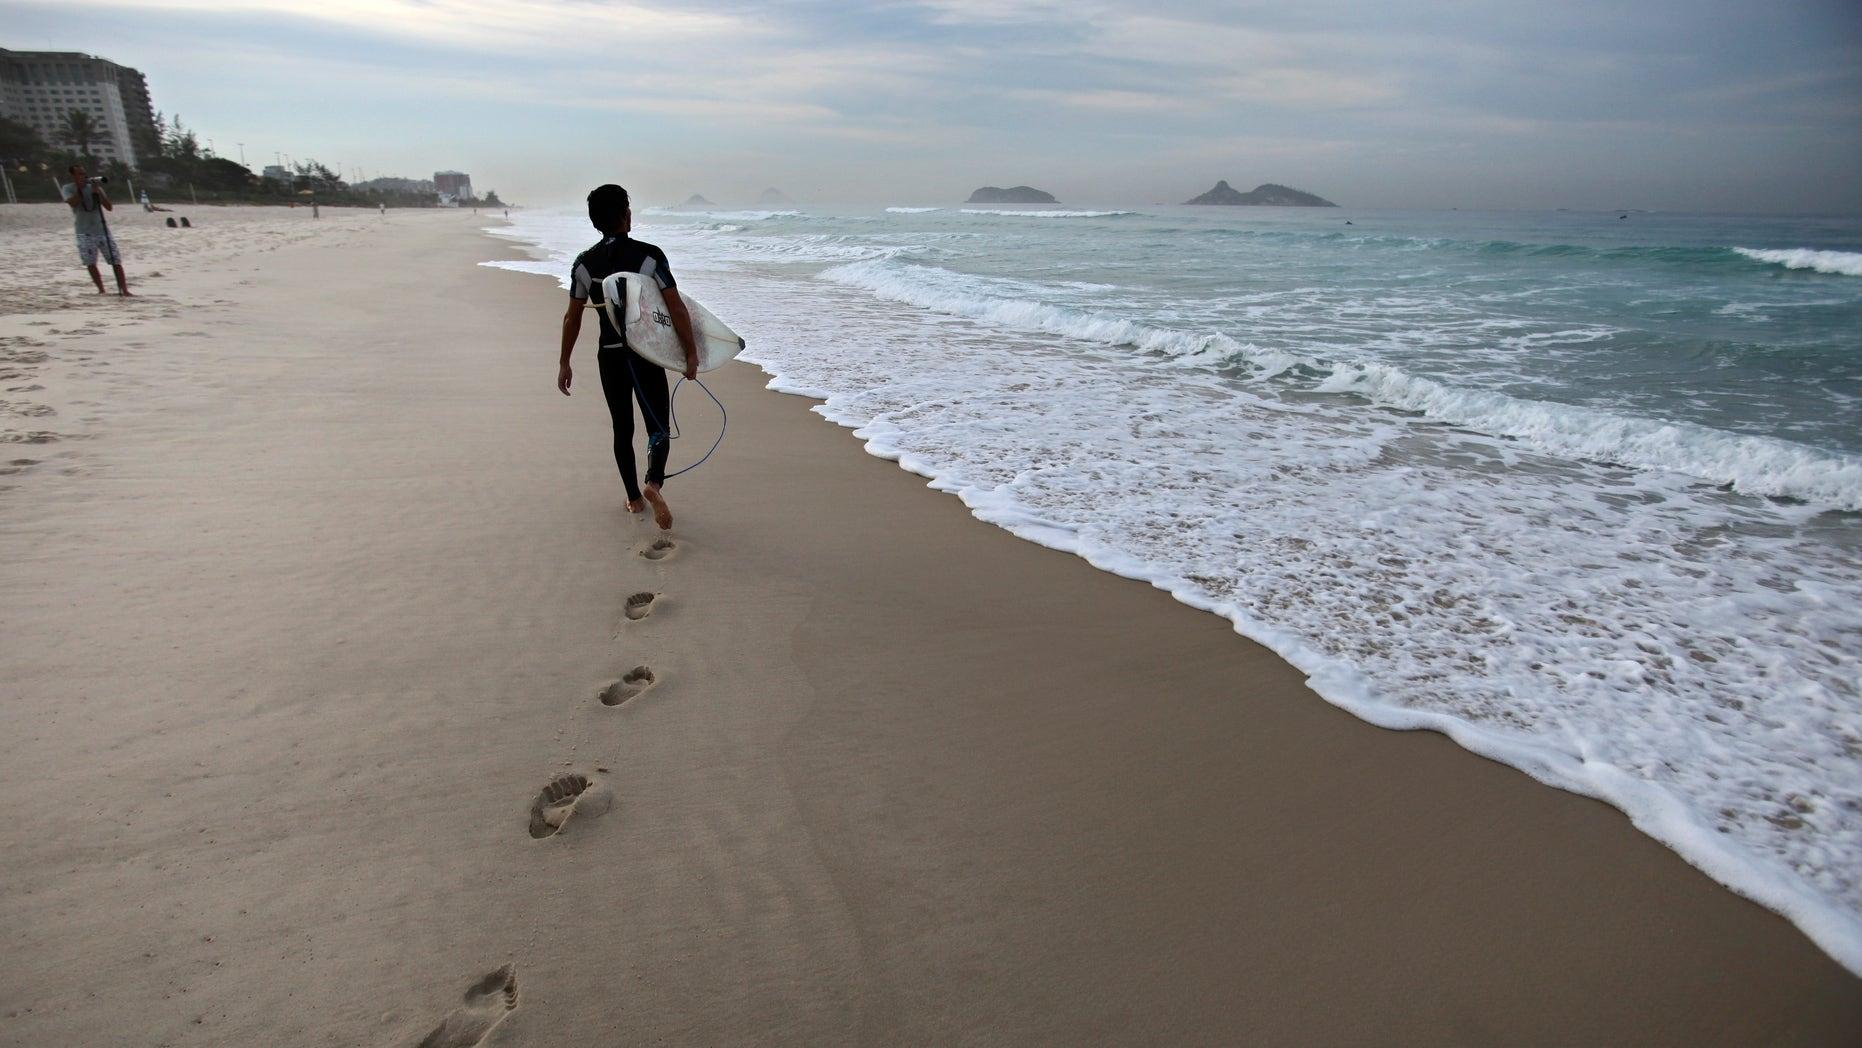 A surfer walks next to the shore at Barra da Tijuca beach before the start of the Billabong Rio Pro surfing championship in Rio de Janeiro, Brazil, Thursday, May 12, 2011. (AP Photo/Victor R. Caivano)